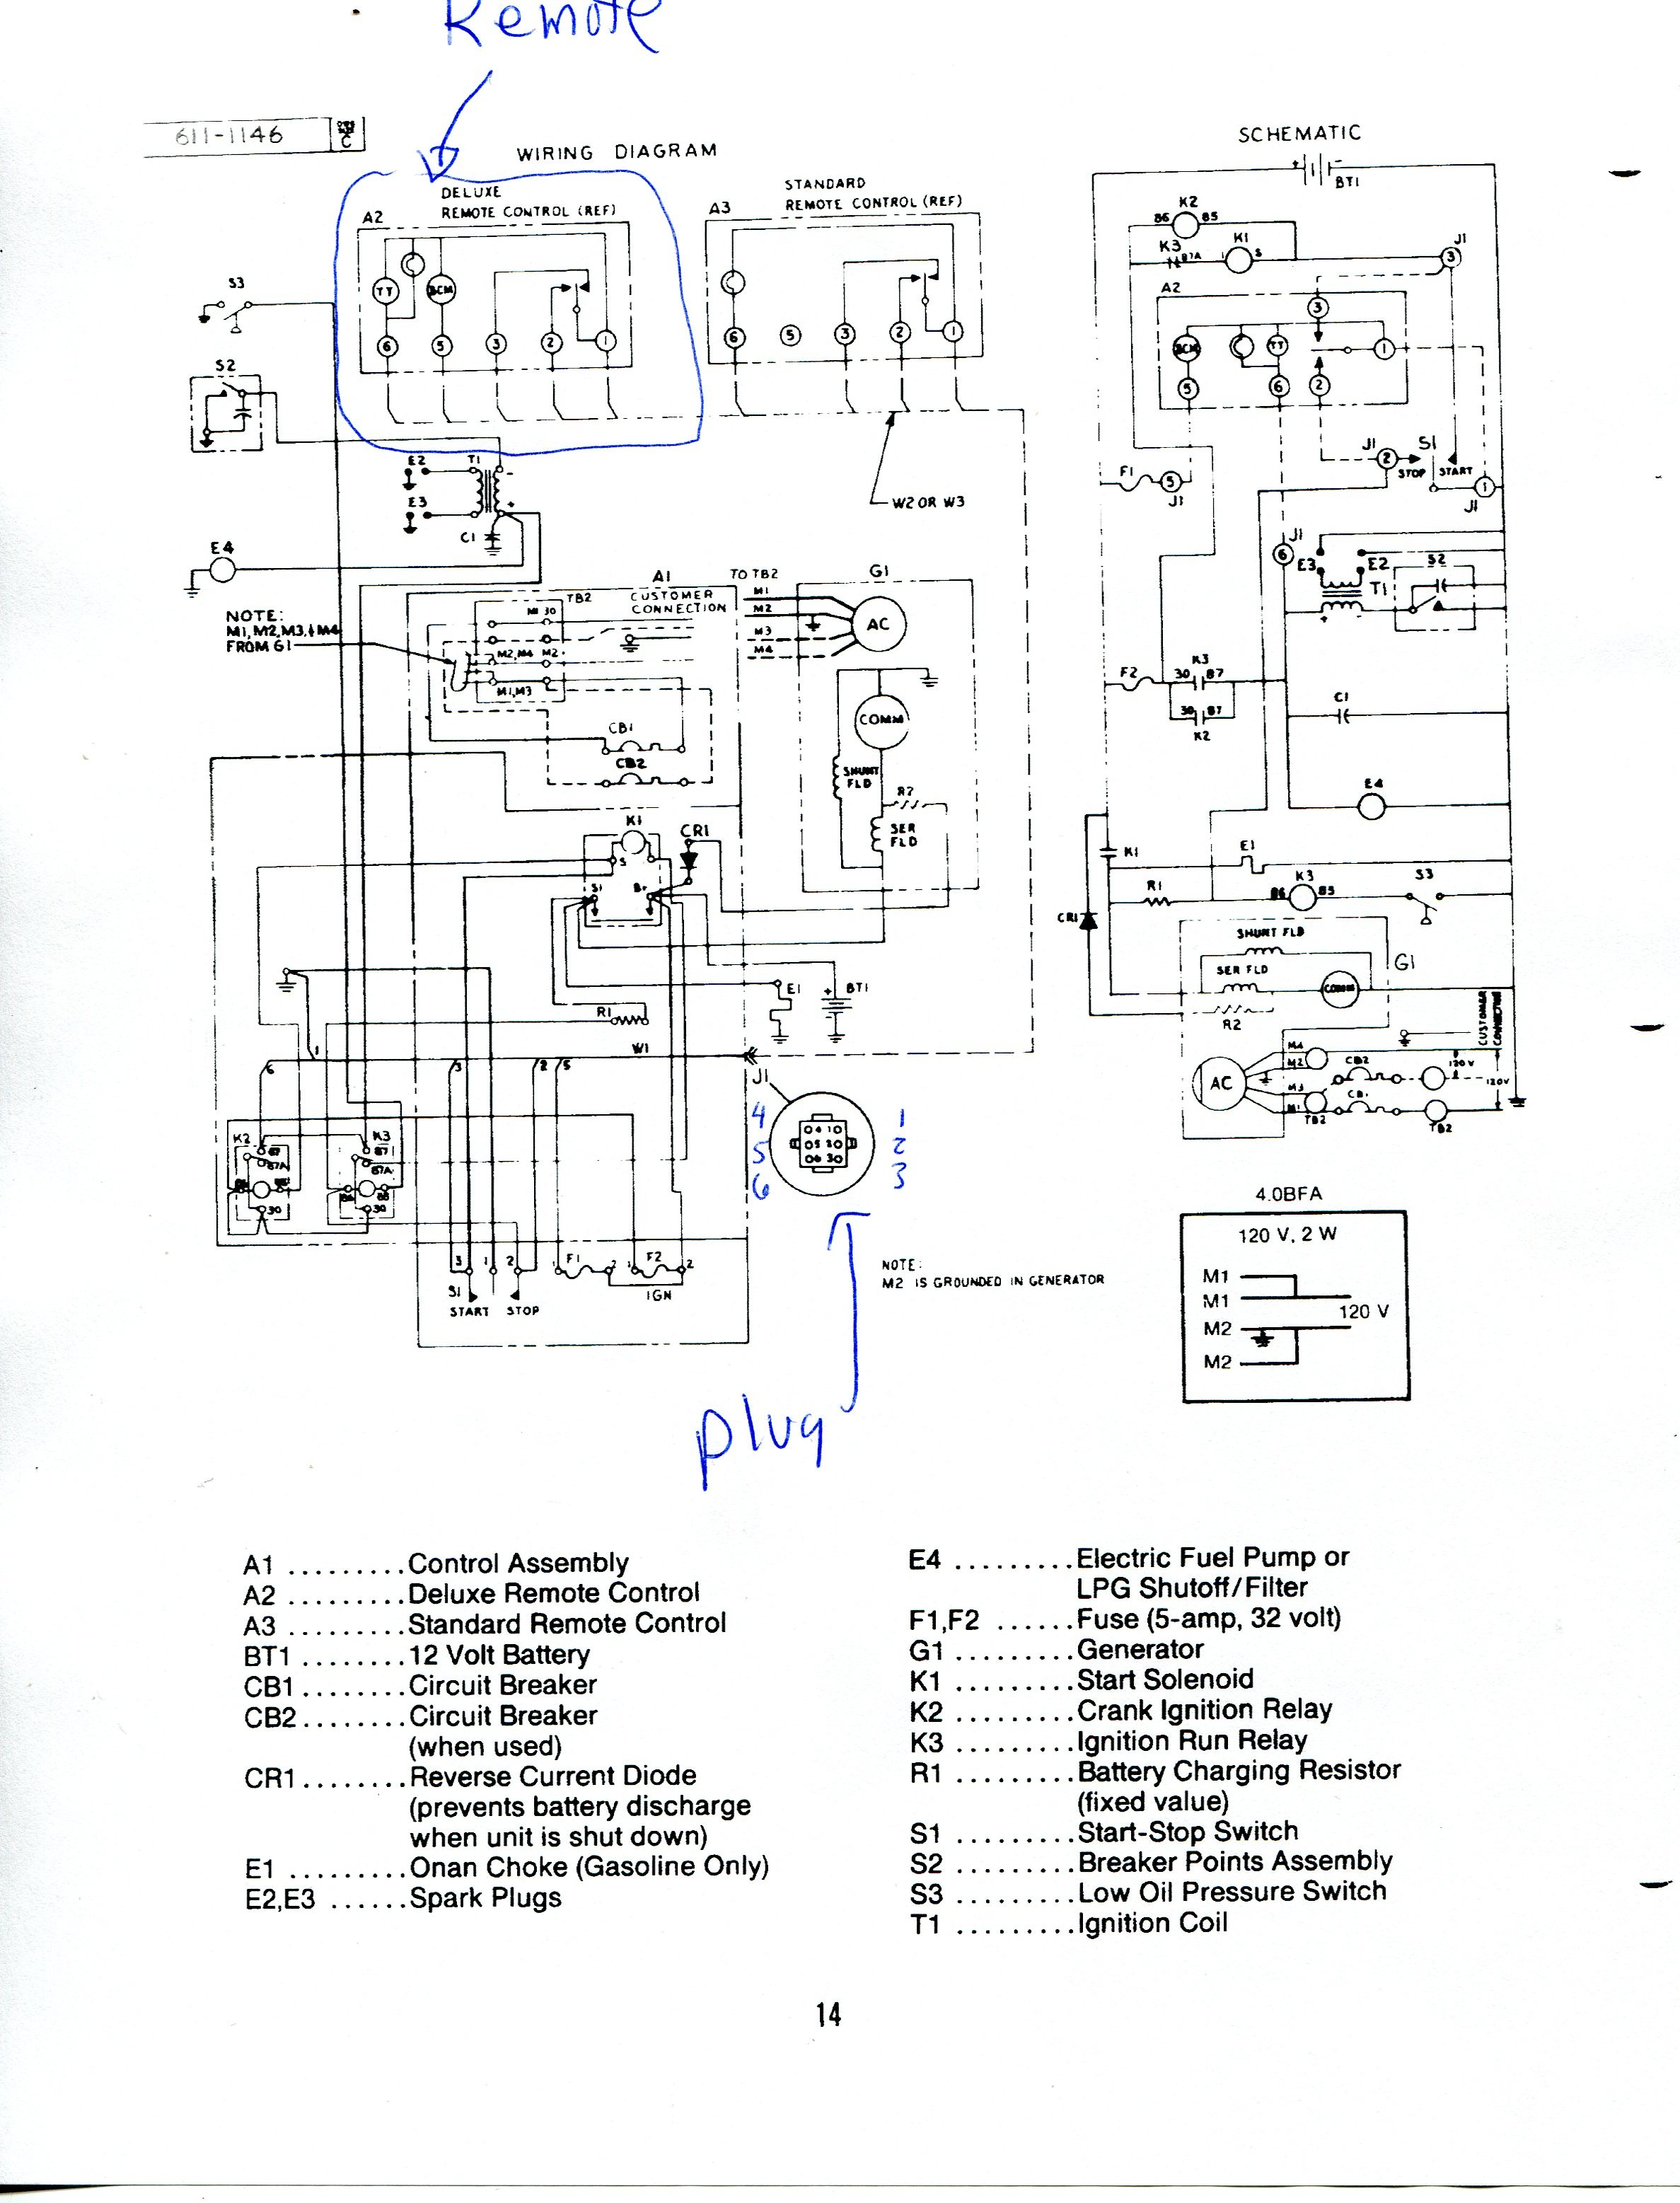 Kohler Voltage Regulator Wiring Diagram Engine Command An 611 1267 Diagrams Of